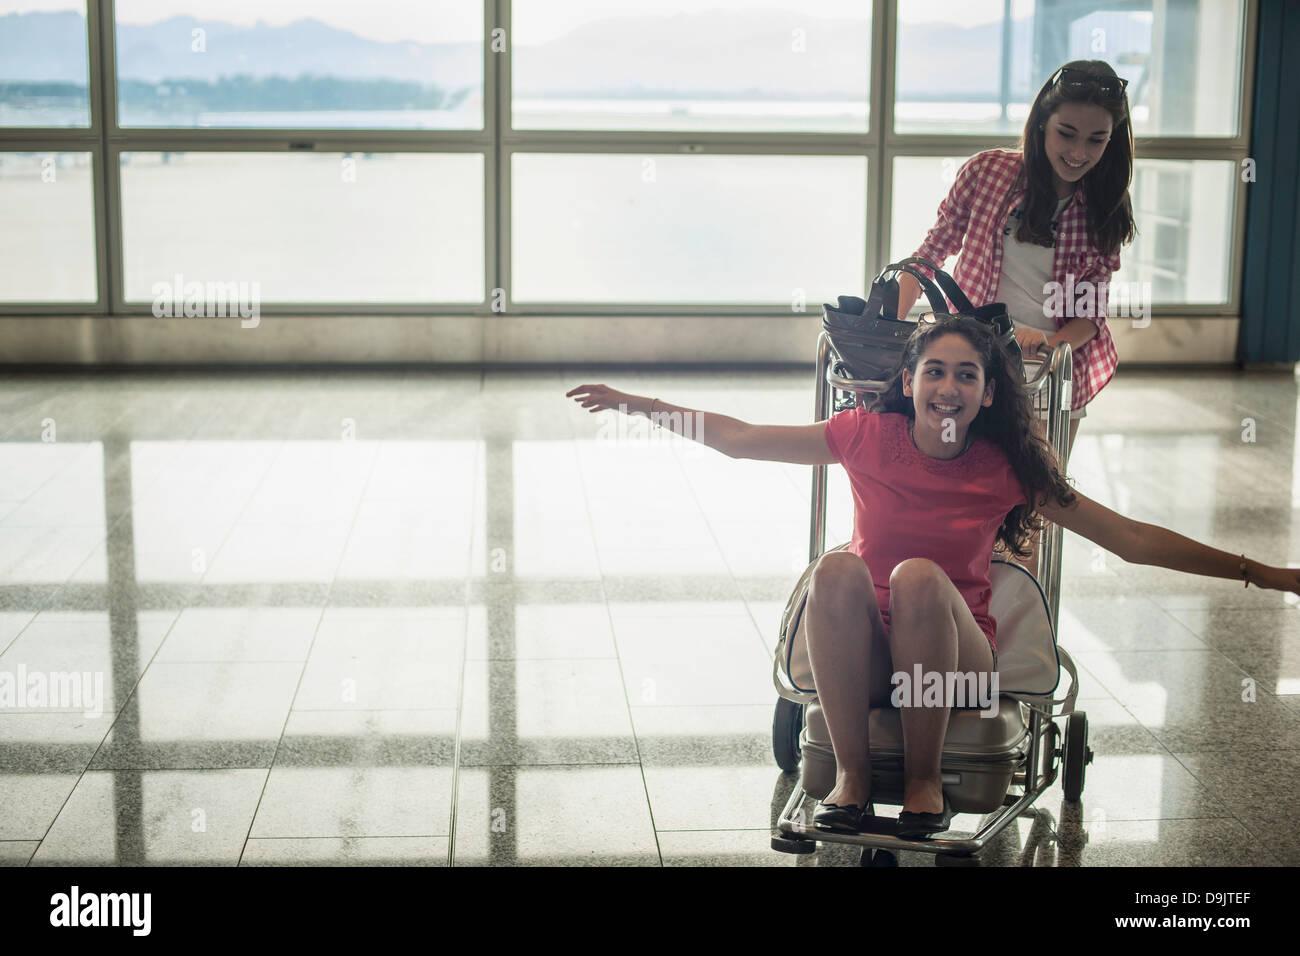 Teenage girl pushing friend on luggage trolley - Stock Image